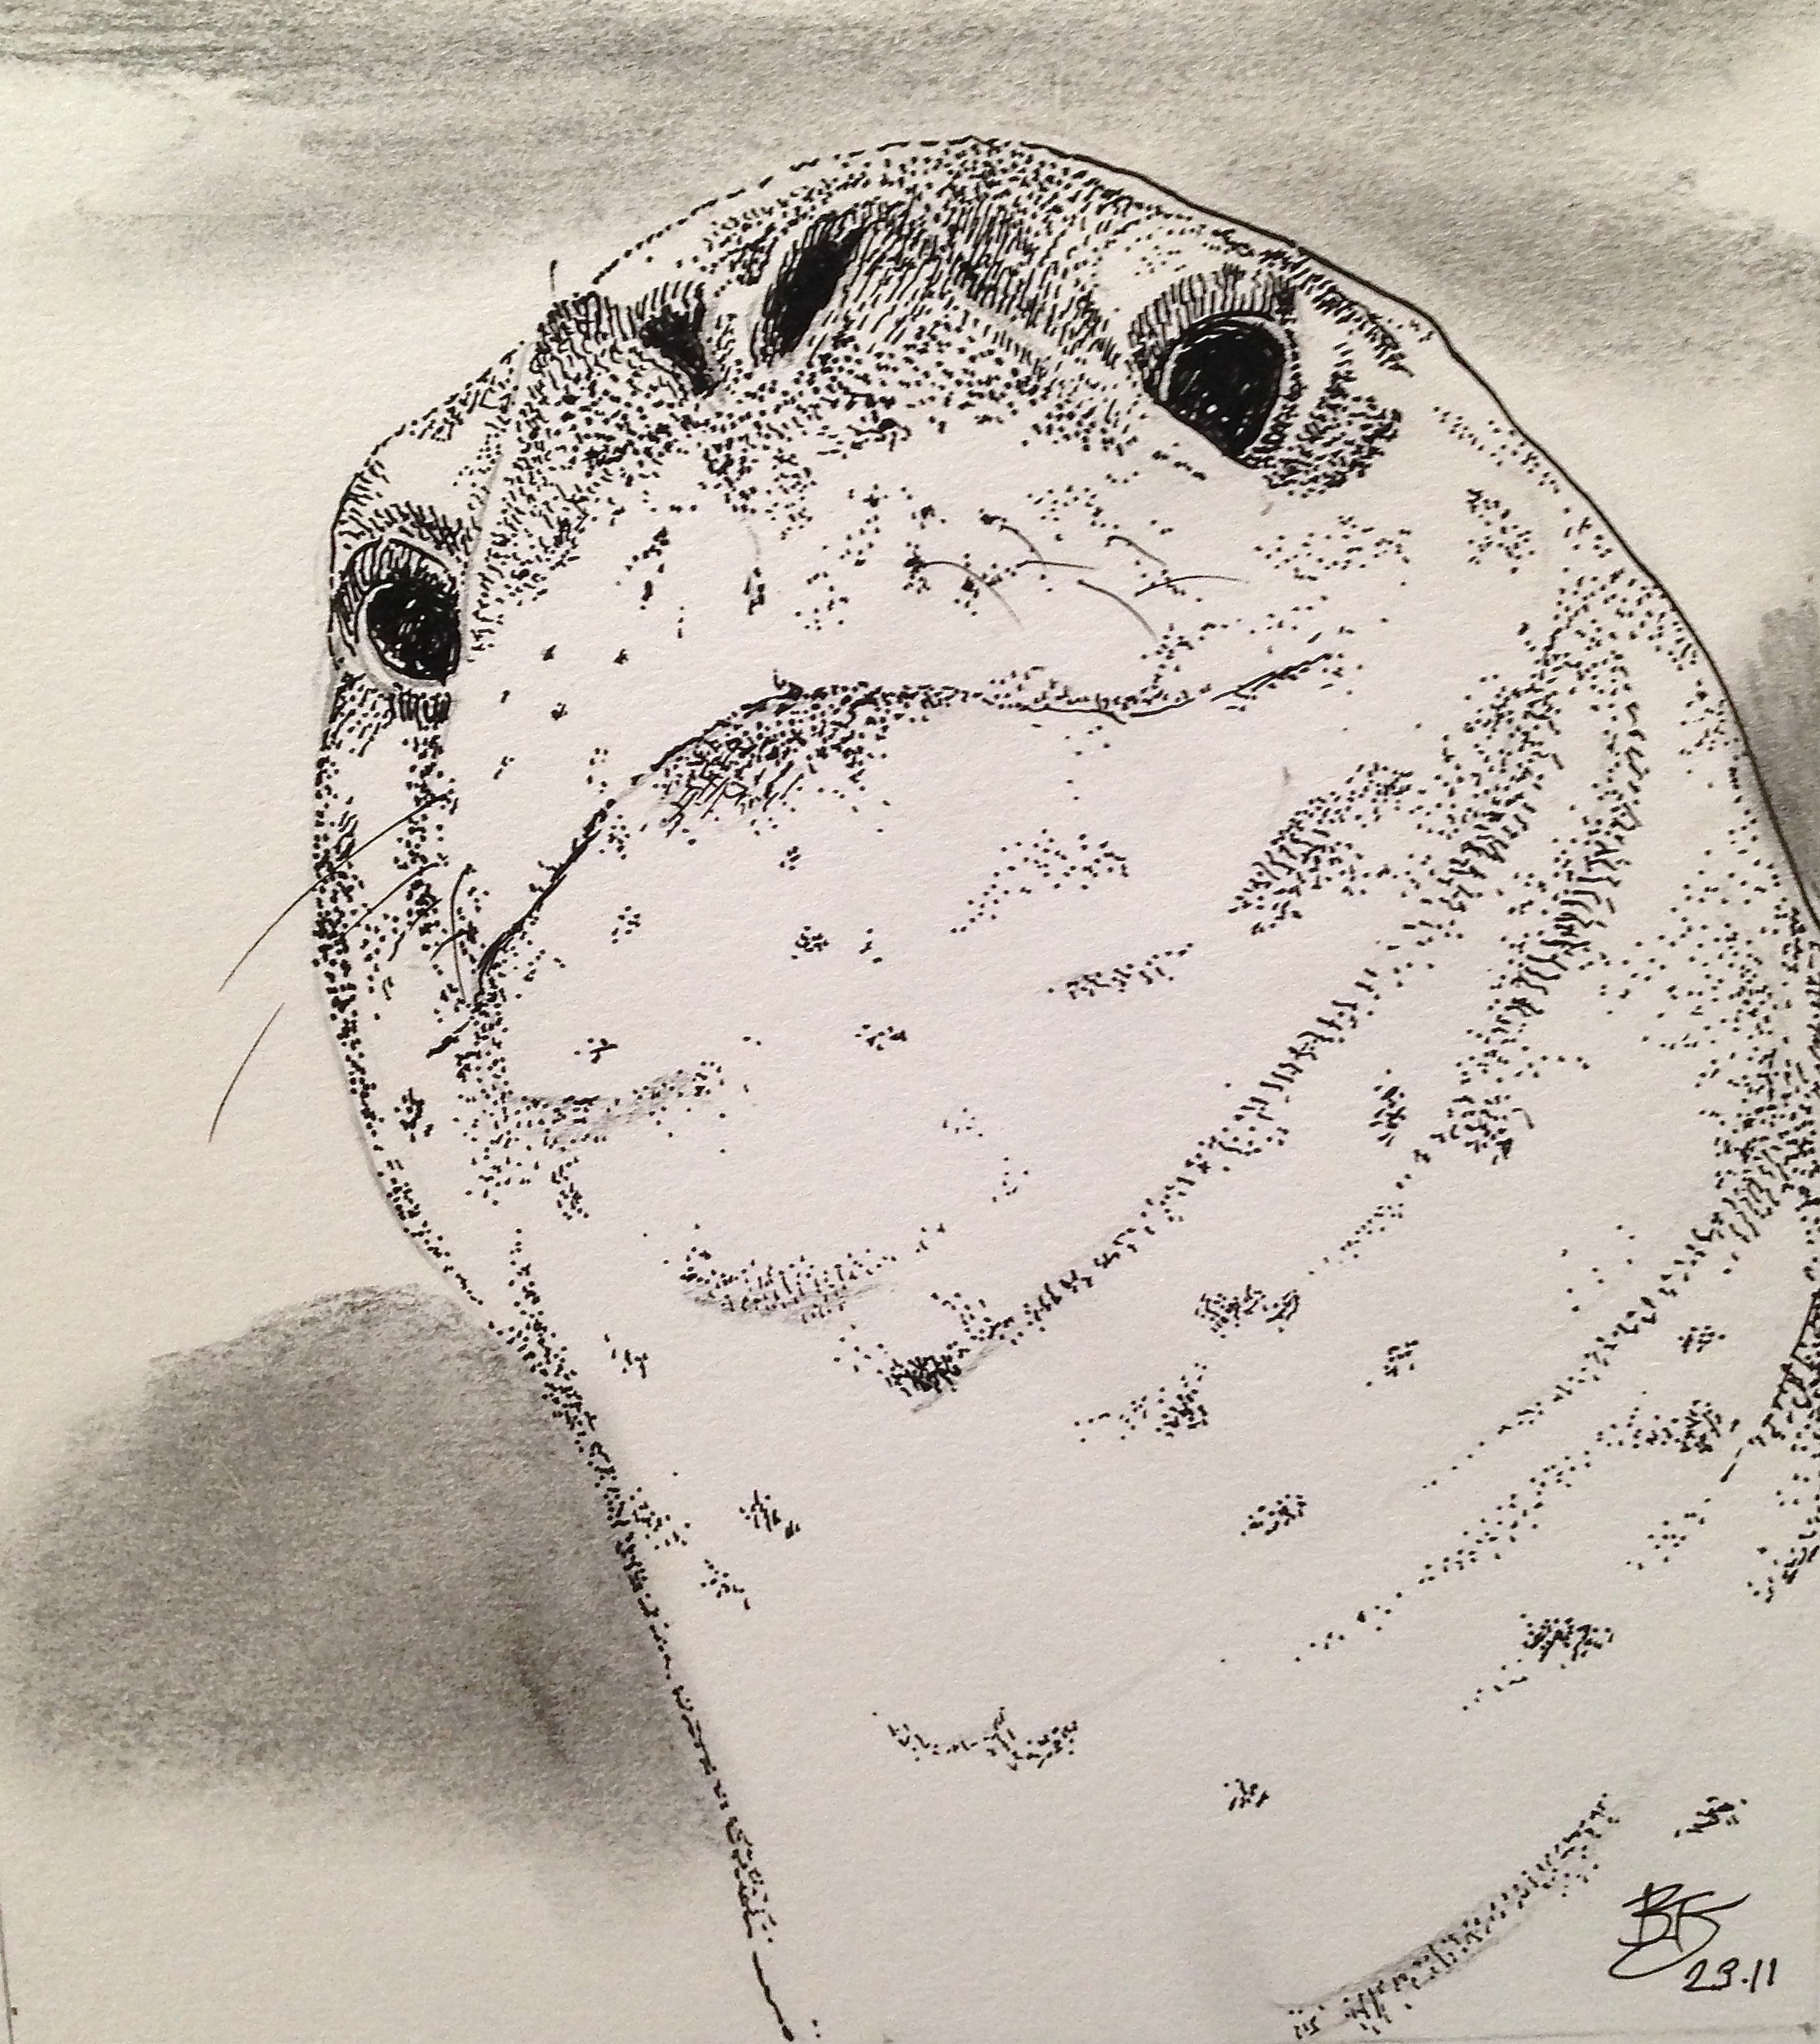 Peeking Leopard Seal-pen drawing | Bennythomas\'s Weblog